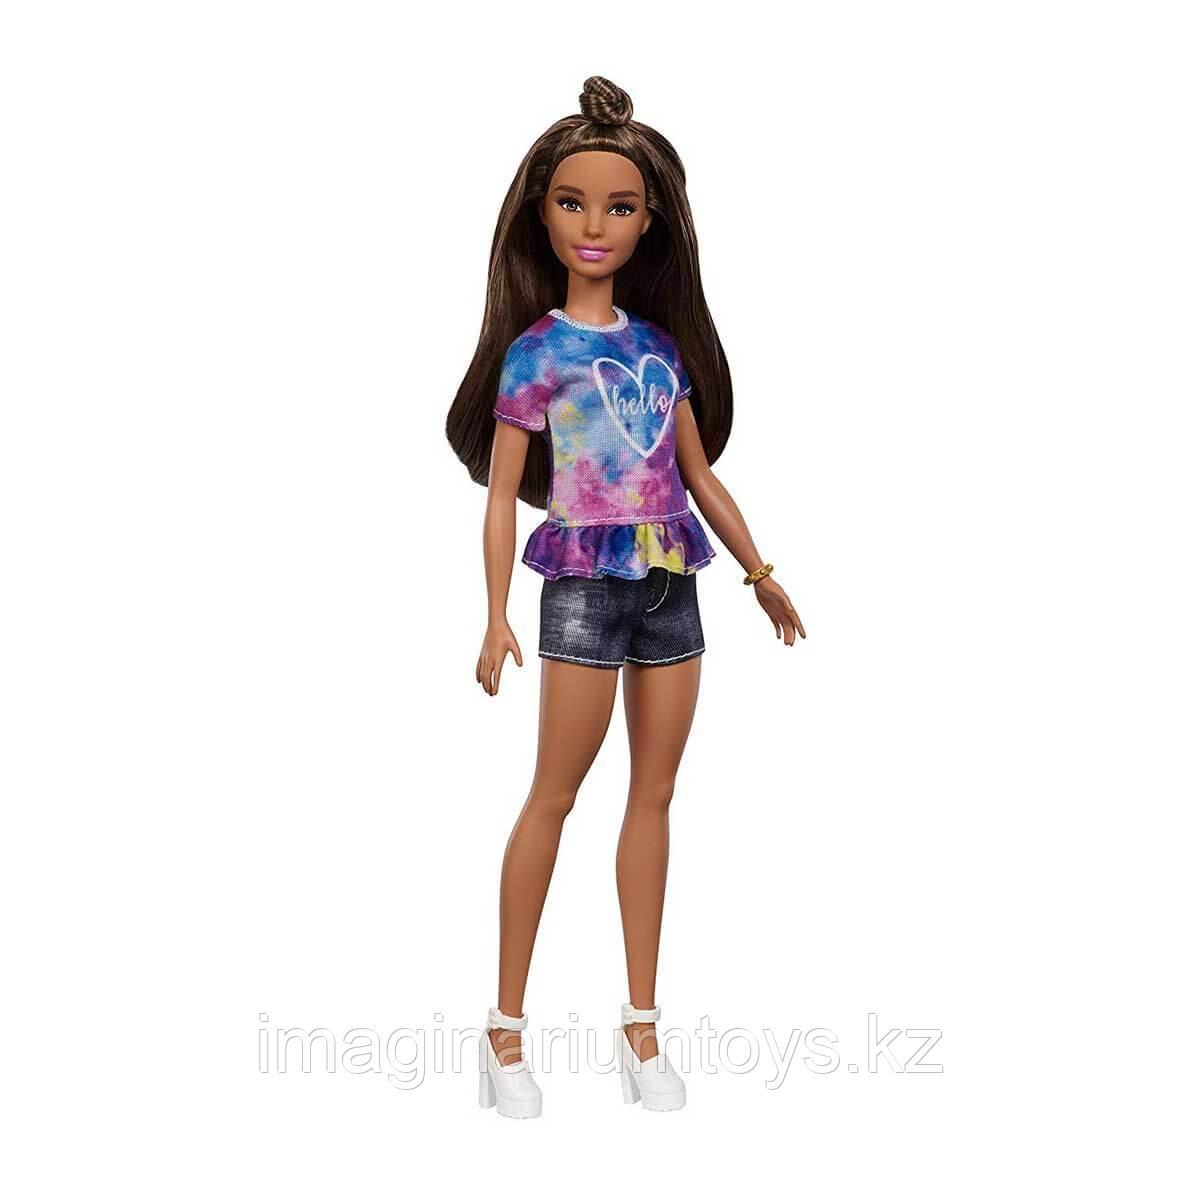 Кукла Барби модница шатенка #112 - фото 1